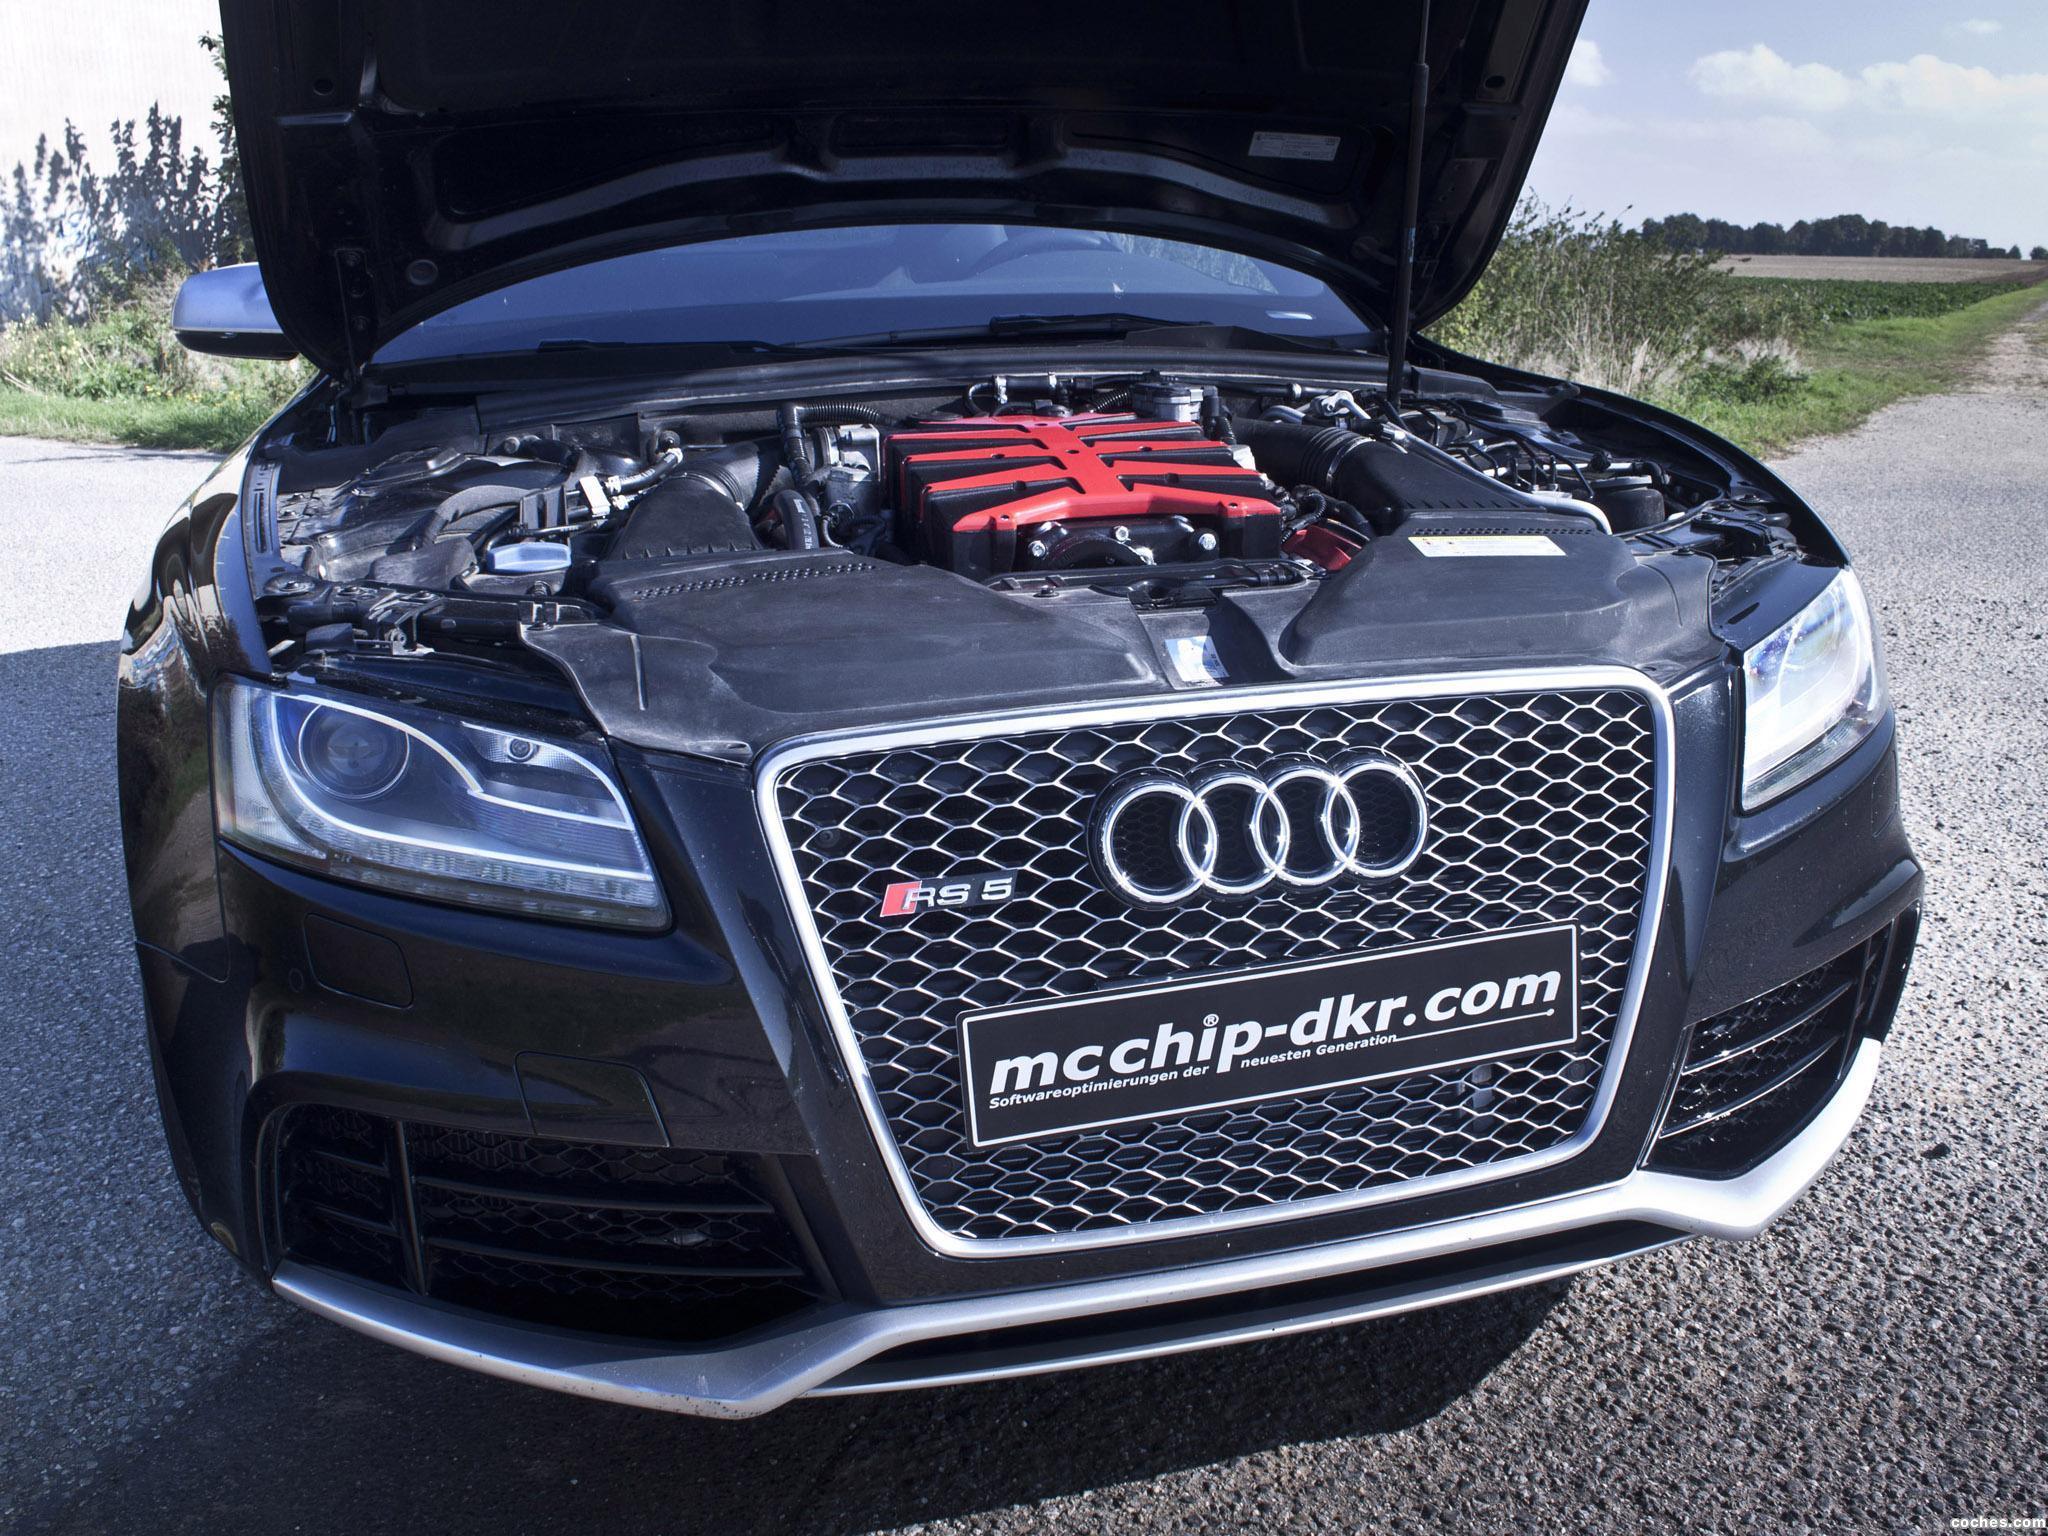 Foto 6 de Audi Mcchip DKR Audi RS5 Kompressor 2013